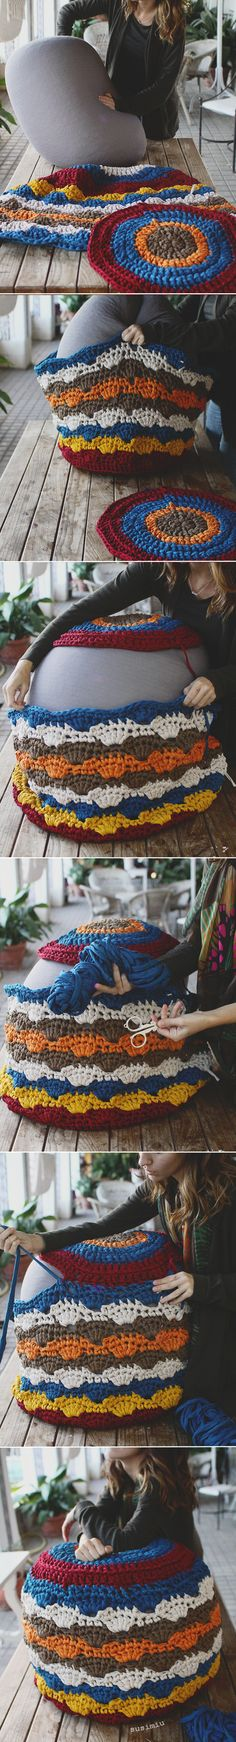 Crochet Puff - Tutorial ❥ 4U hilariafina http://www.pinterest.com/hilariafina/